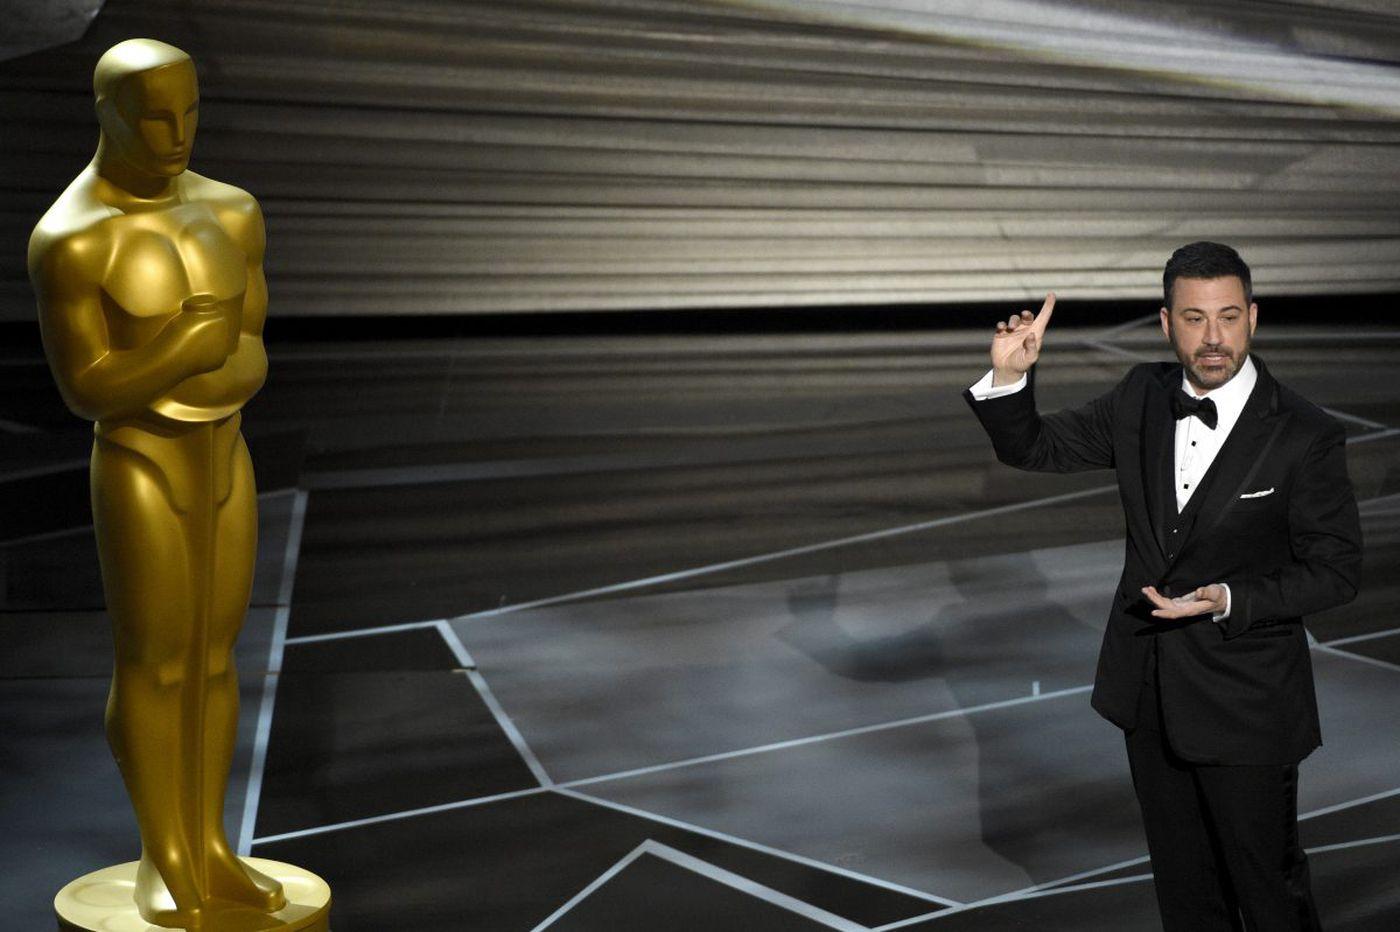 Oscars 2018: Jimmy Kimmel gets it done with jokes and a Jet Ski